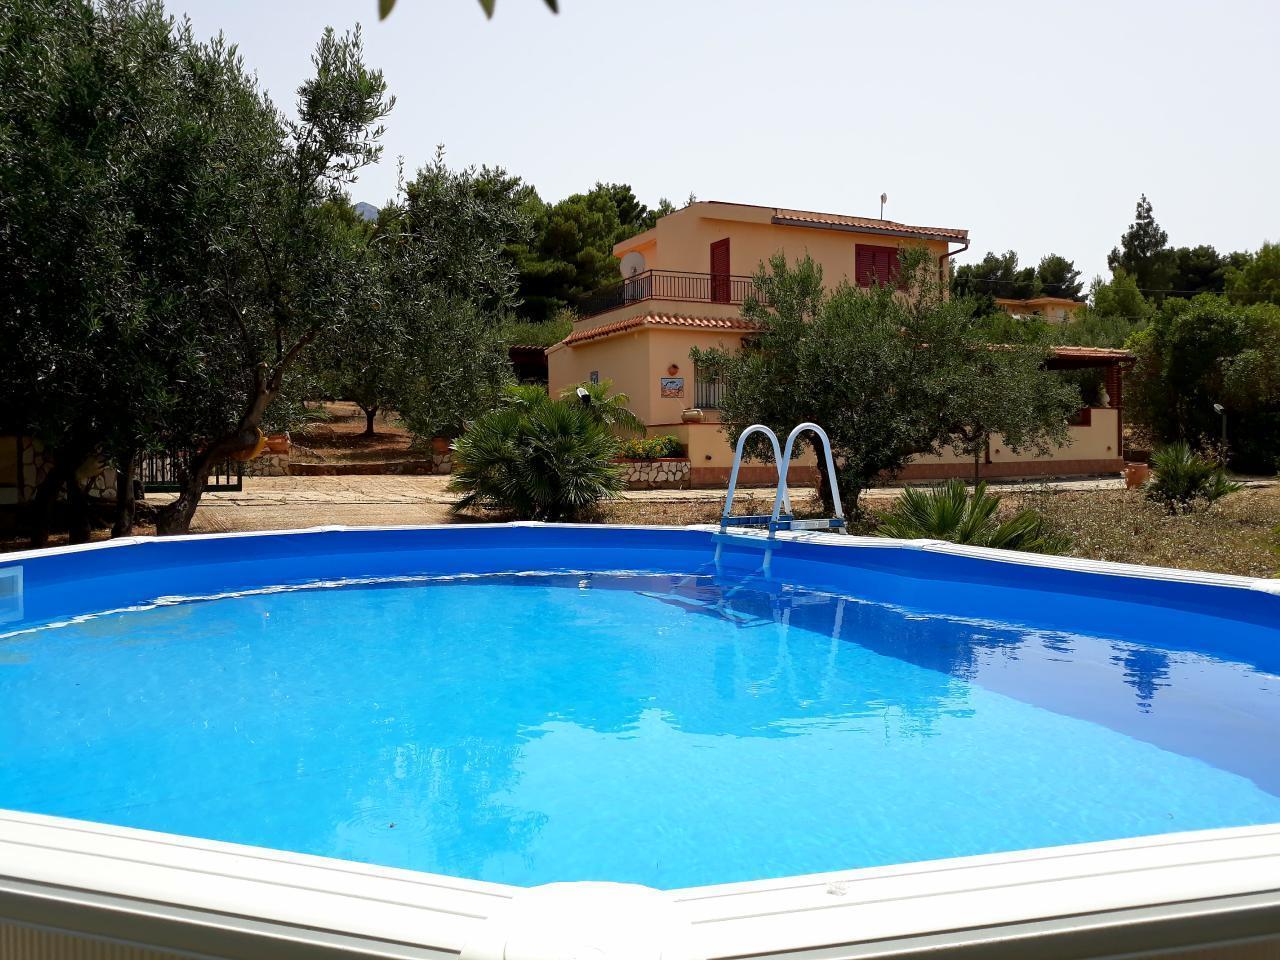 Maison de vacances Villa Antonella Ferienhaus mit Pool für 8 Personen (866914), Castellammare del Golfo, Trapani, Sicile, Italie, image 16